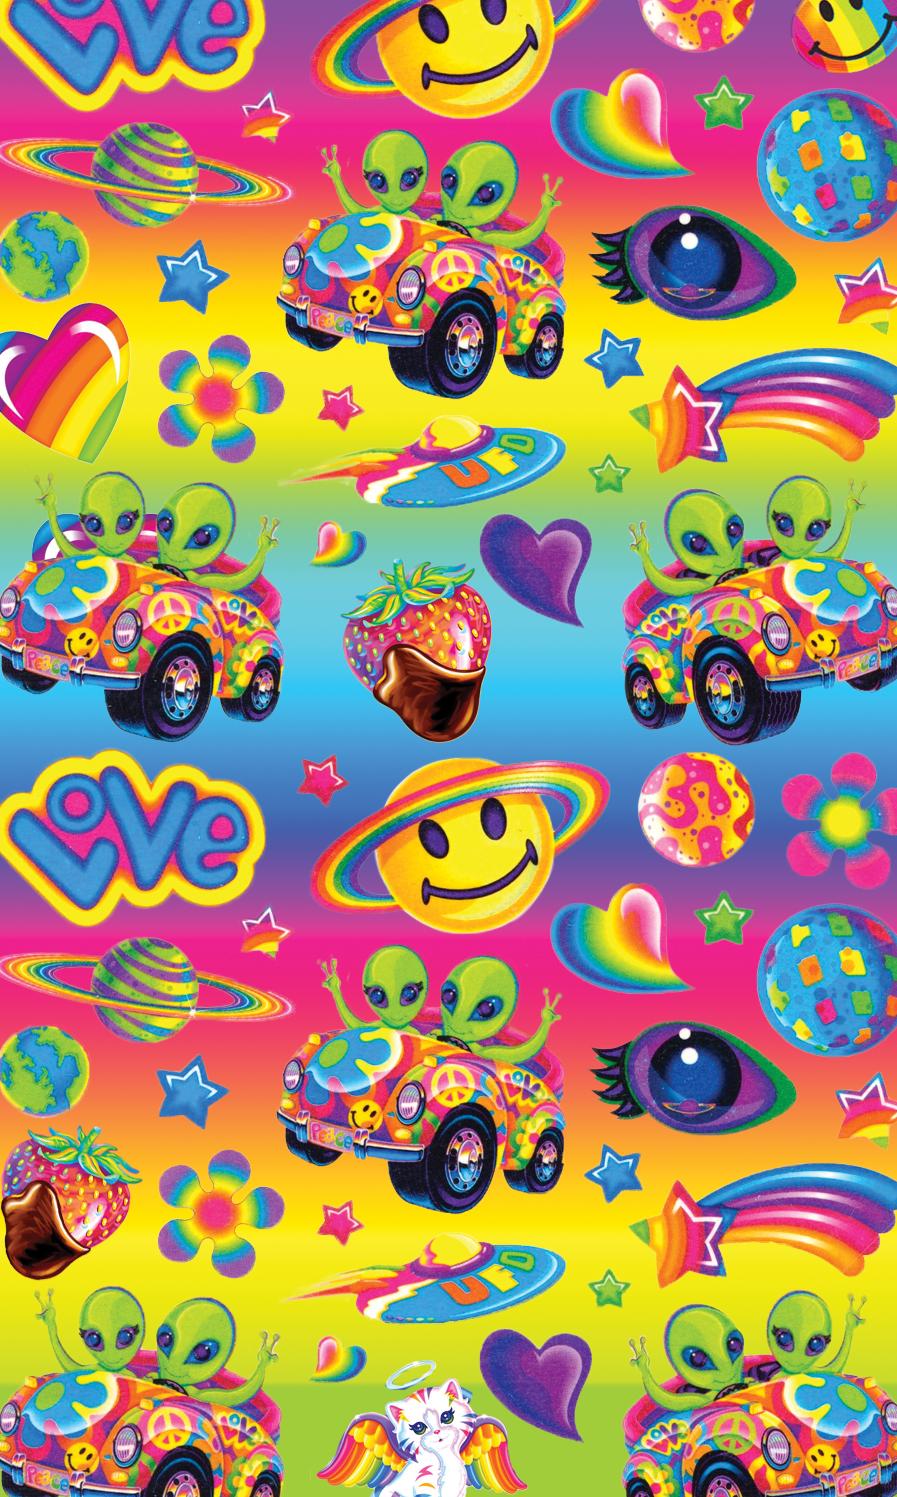 Lisa Frank Phone Wallpapers - Wallpaper Cave